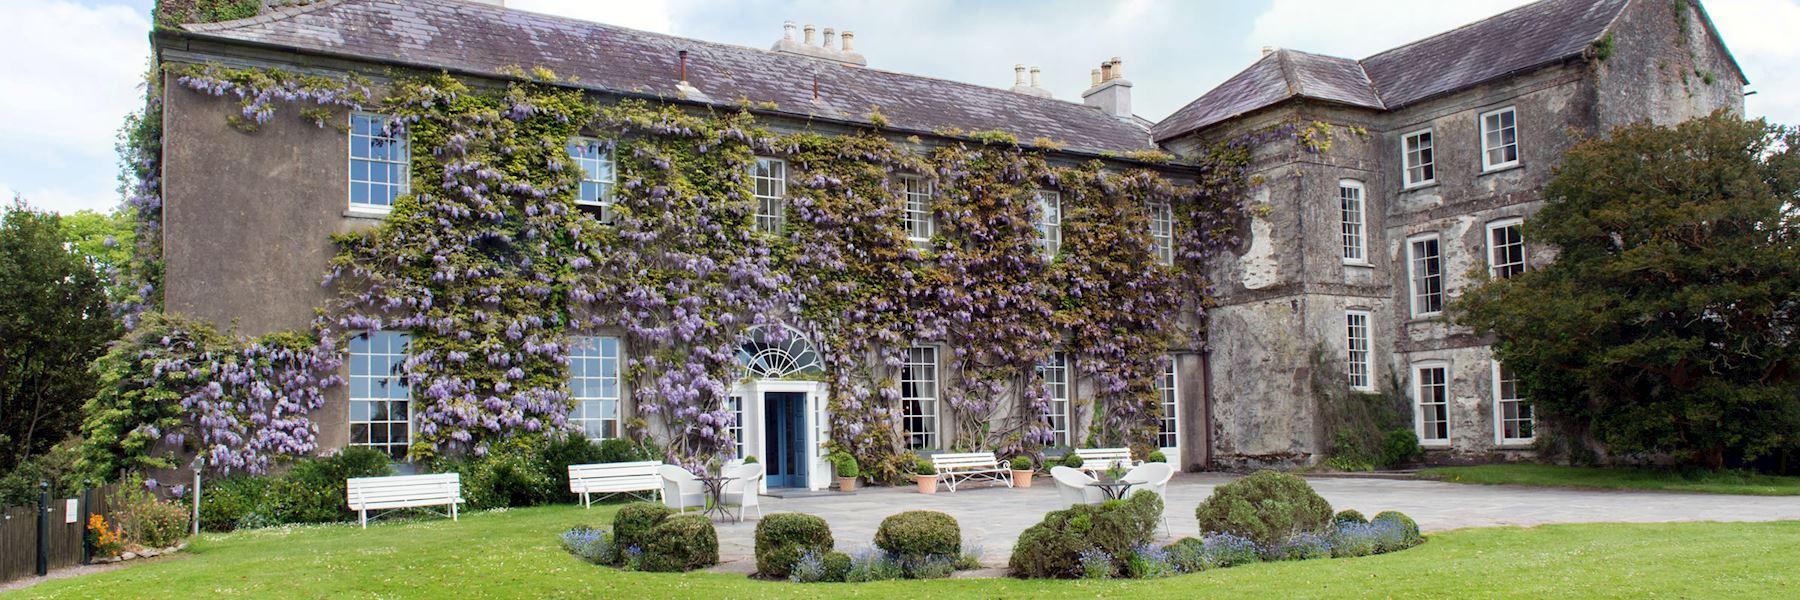 Ballymaloe house contact